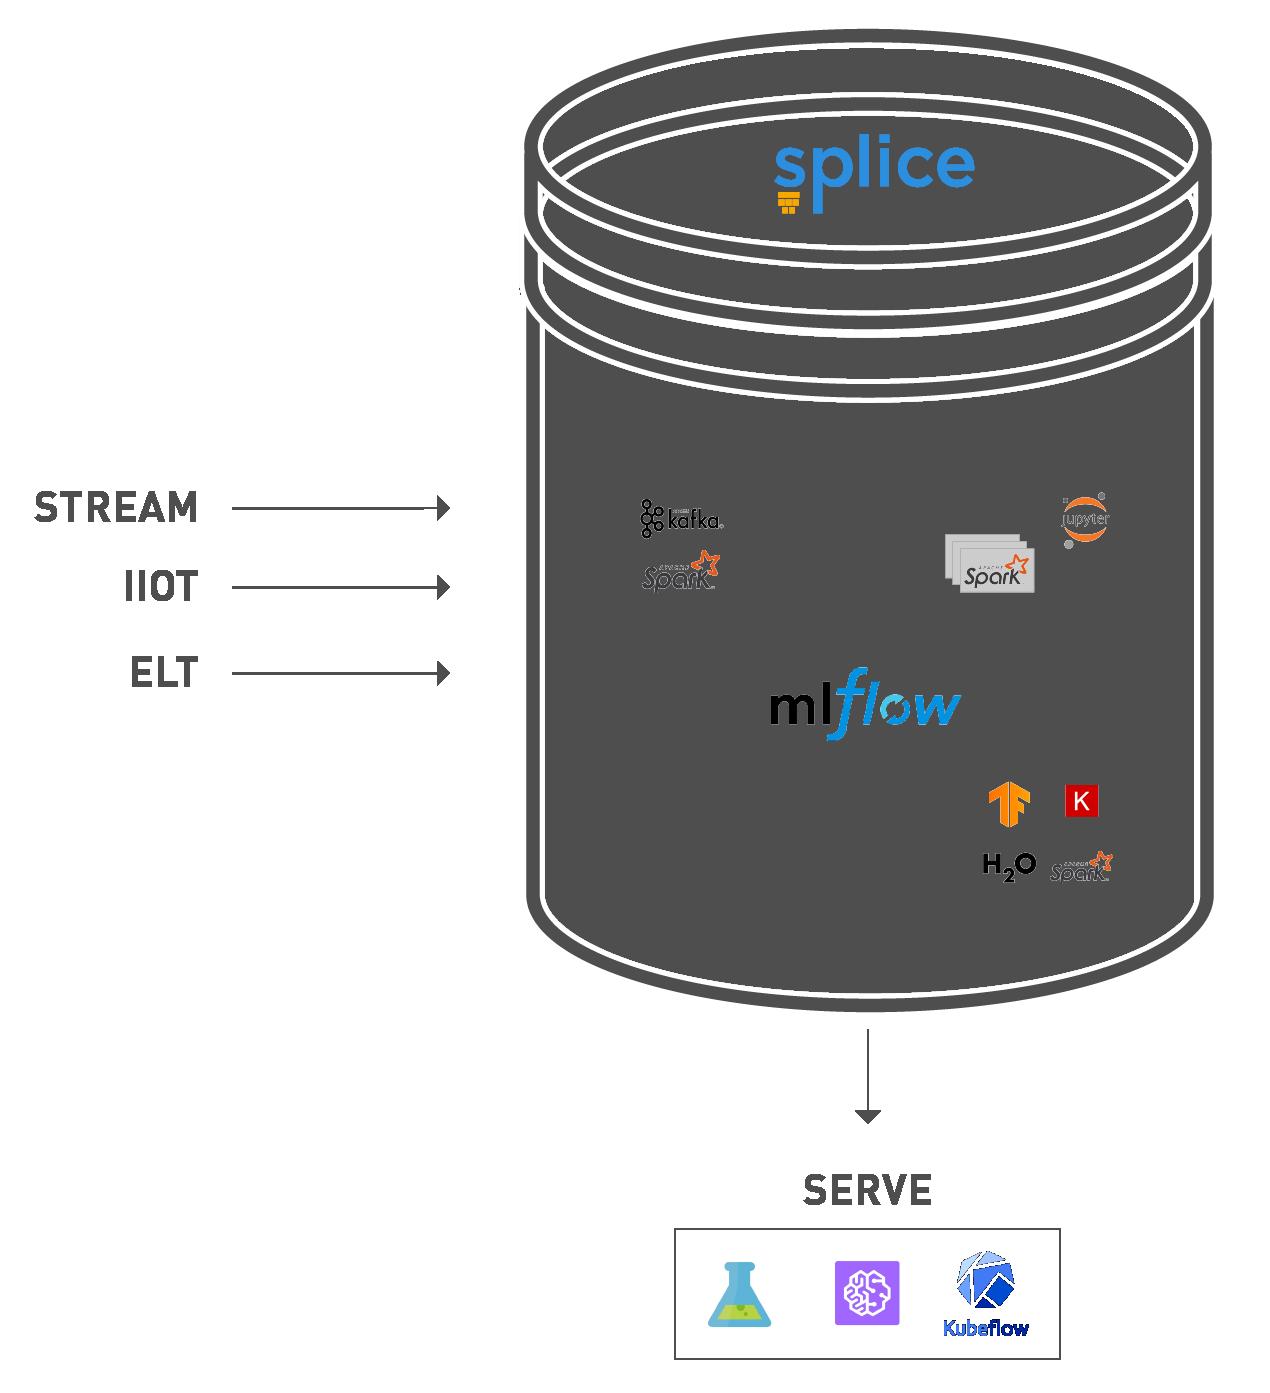 splice-machine-ml-manager